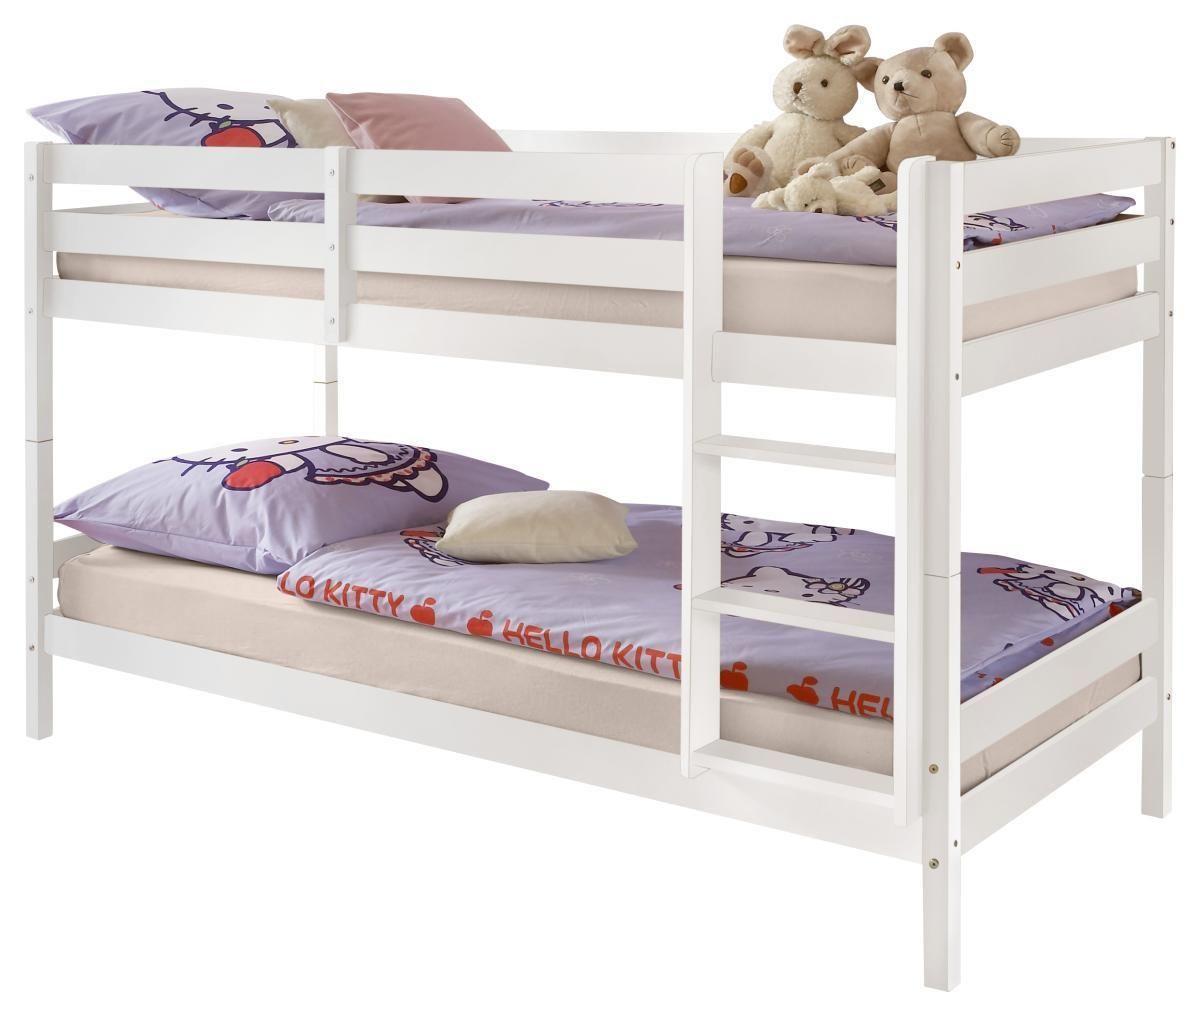 Etagenbett Ja Oder Nein : Kinderbett etagenbett pauli buche vollholz massiv weiß lackiert